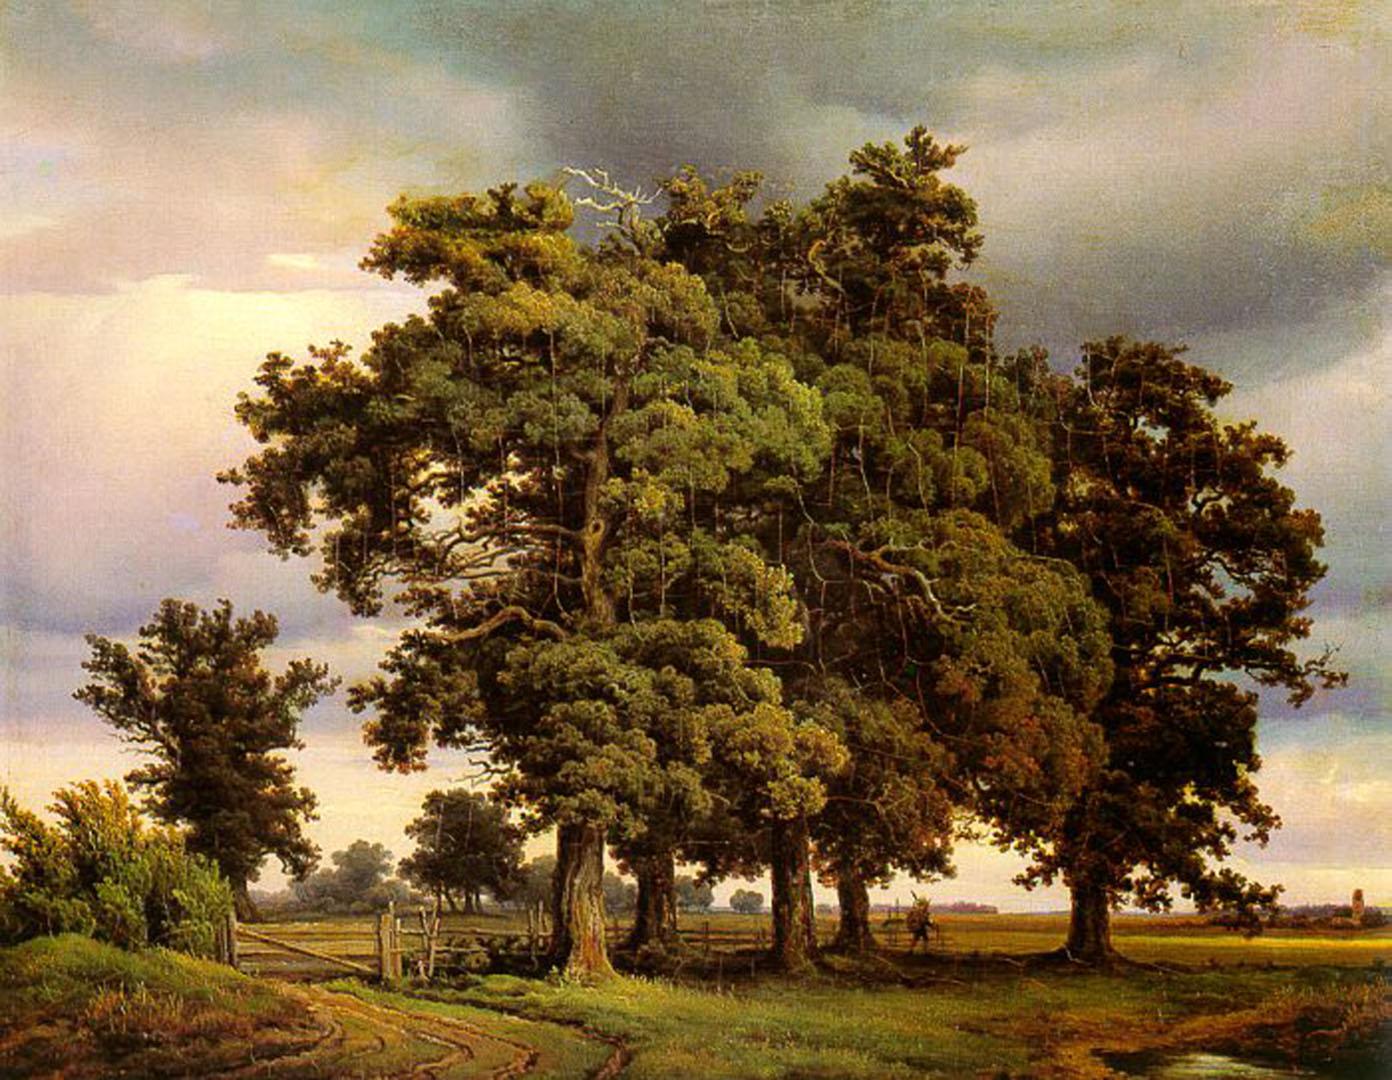 Oak Trees   German Art Wallpaper Image 1392x1080